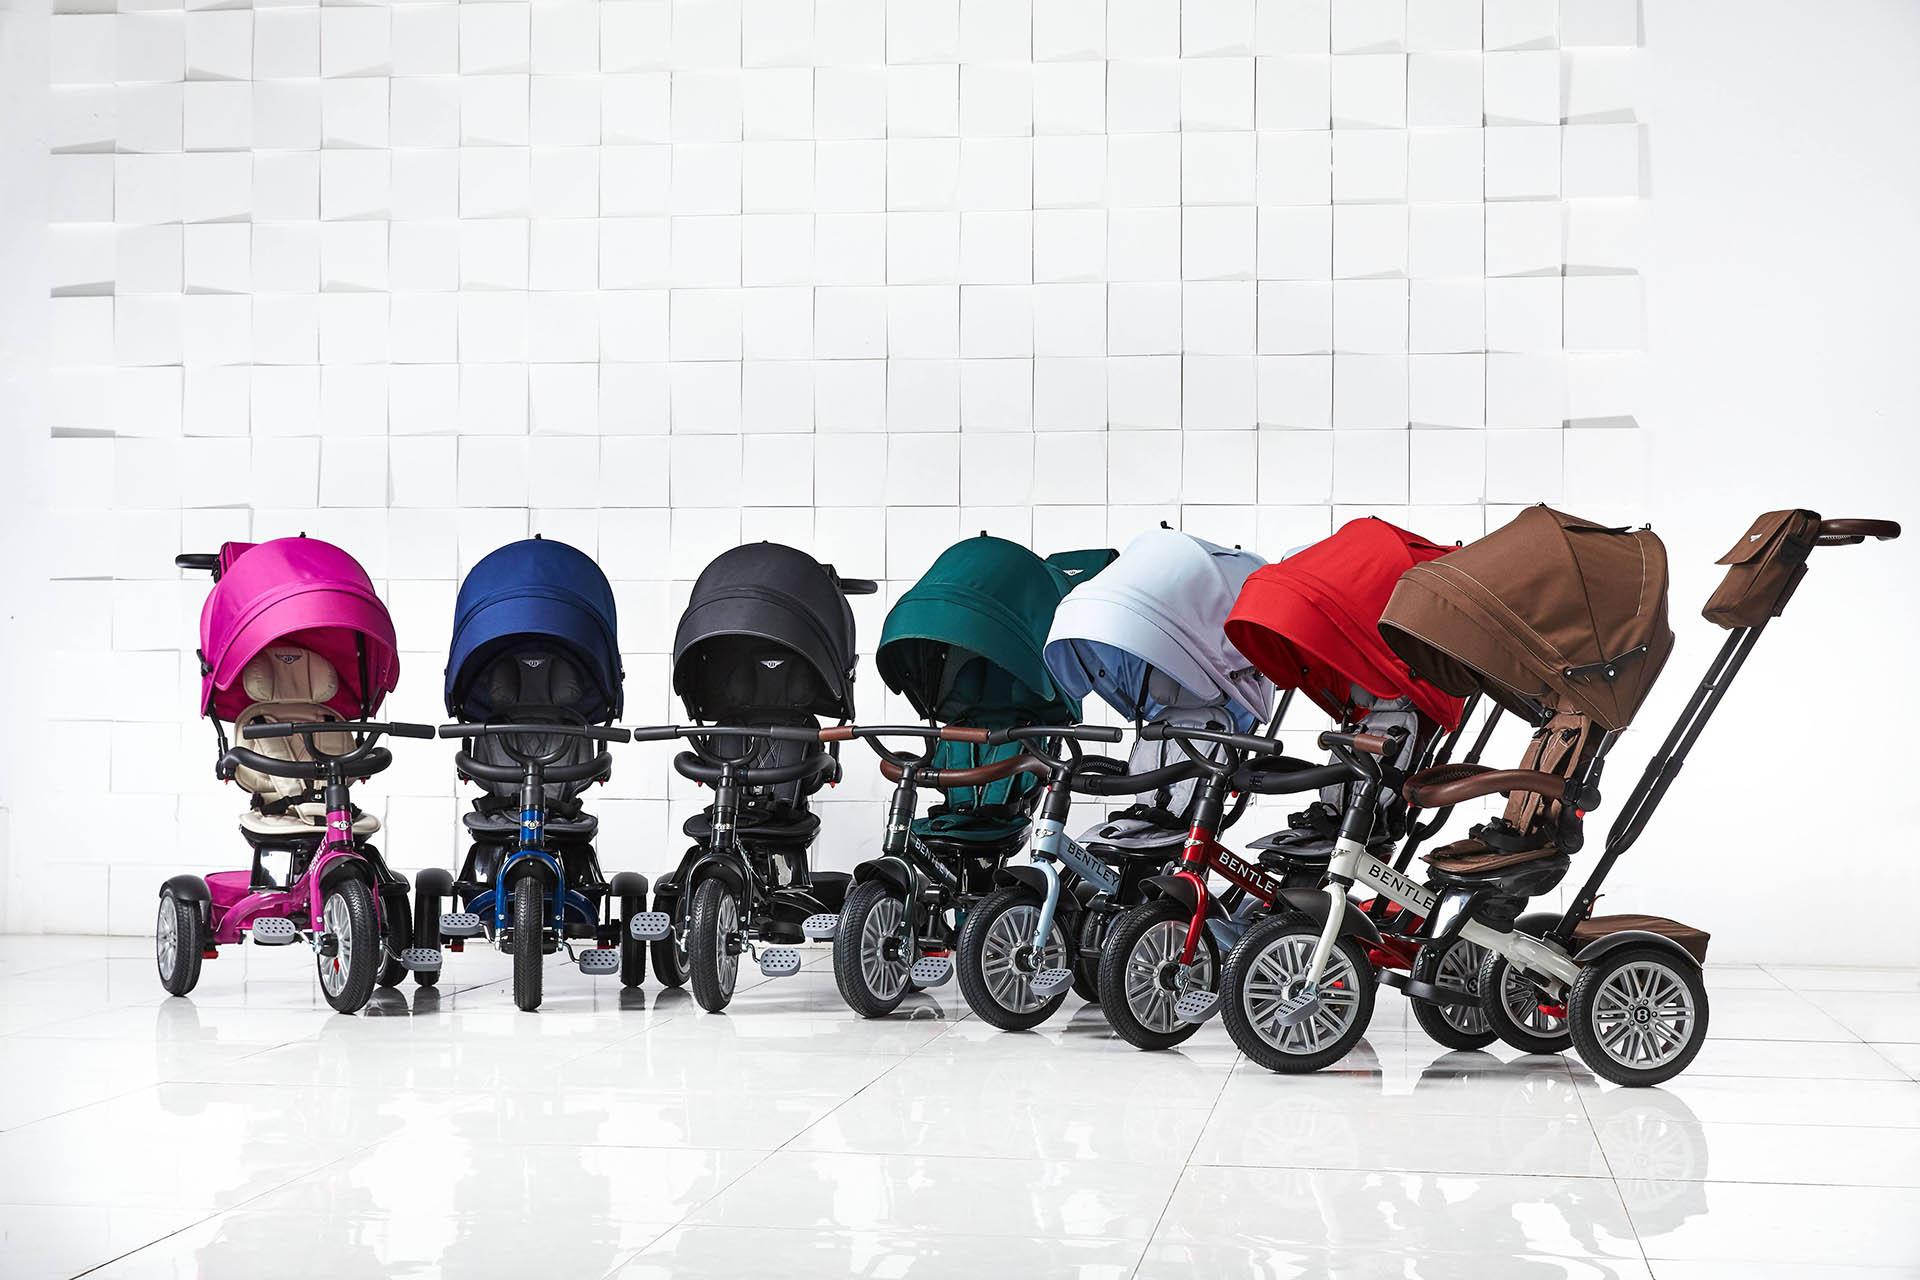 Bentley Trikes 6in1 Children Stroller Kids Tricycle Bike